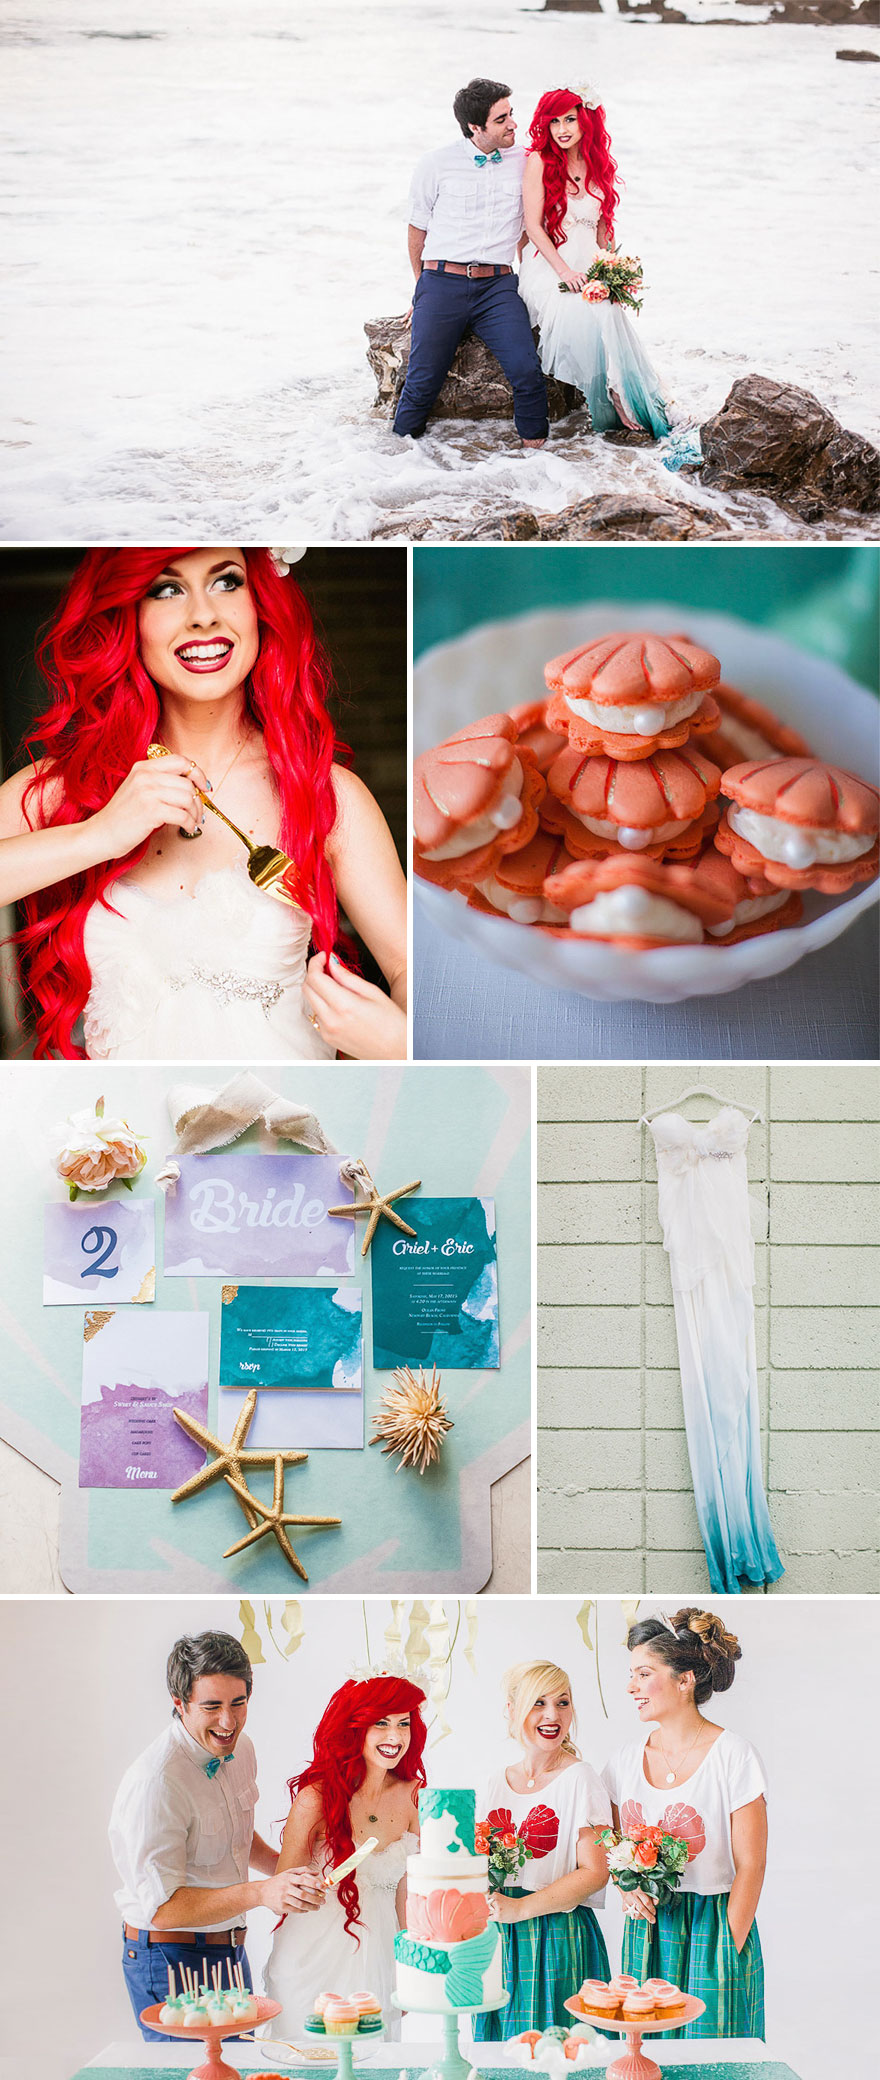 foto-matrimonio-tematico-immagini-02